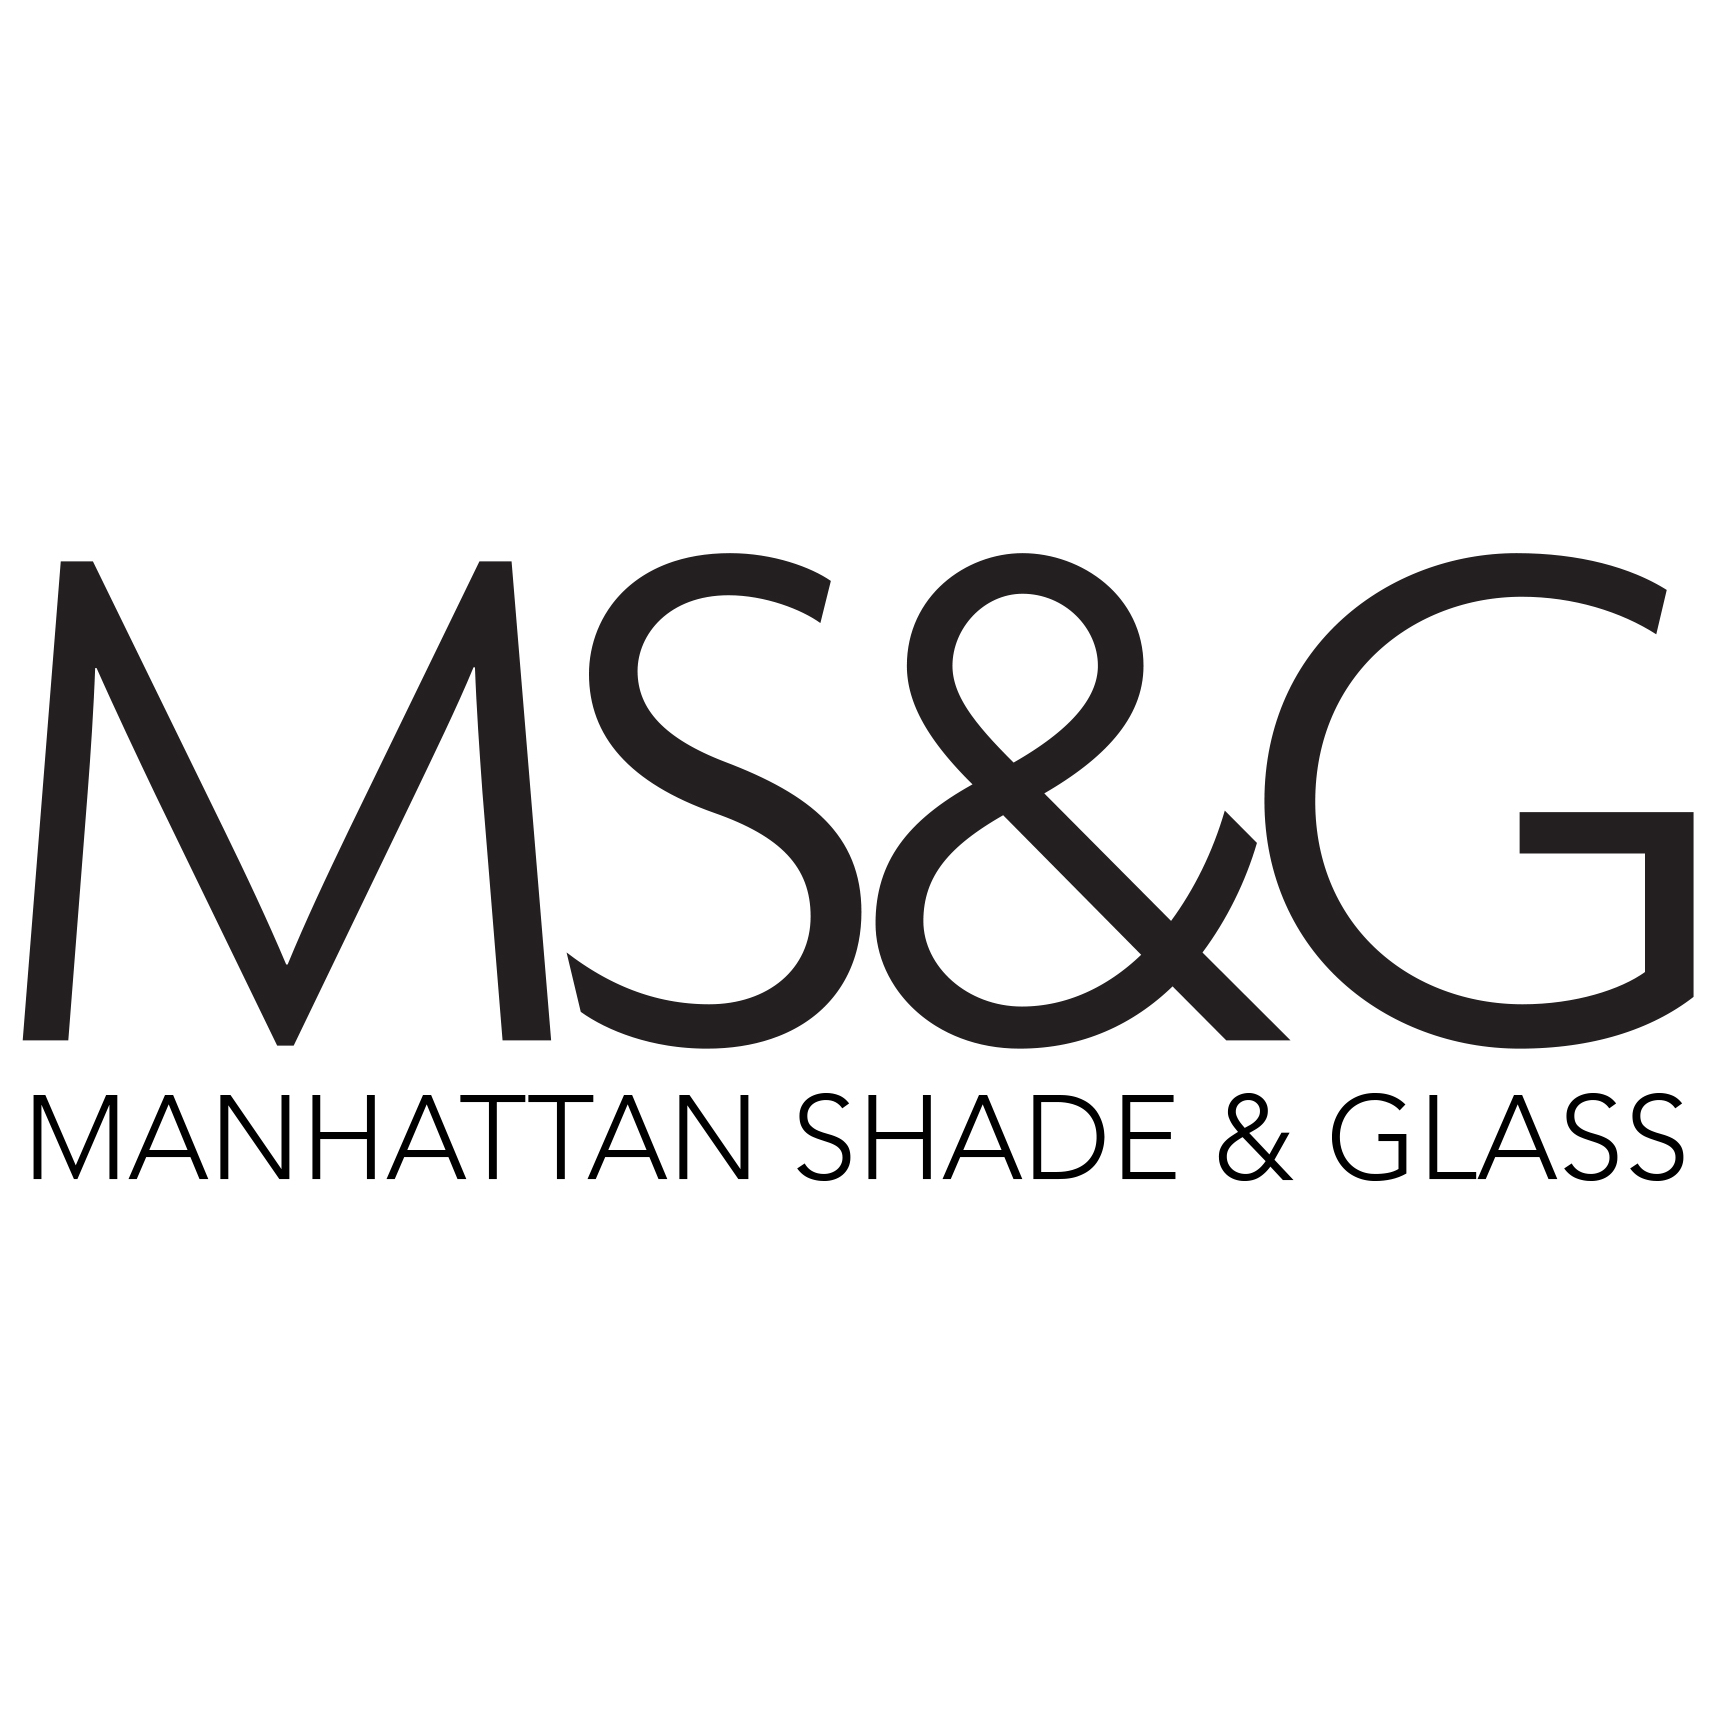 Manhattan Shade & Glass